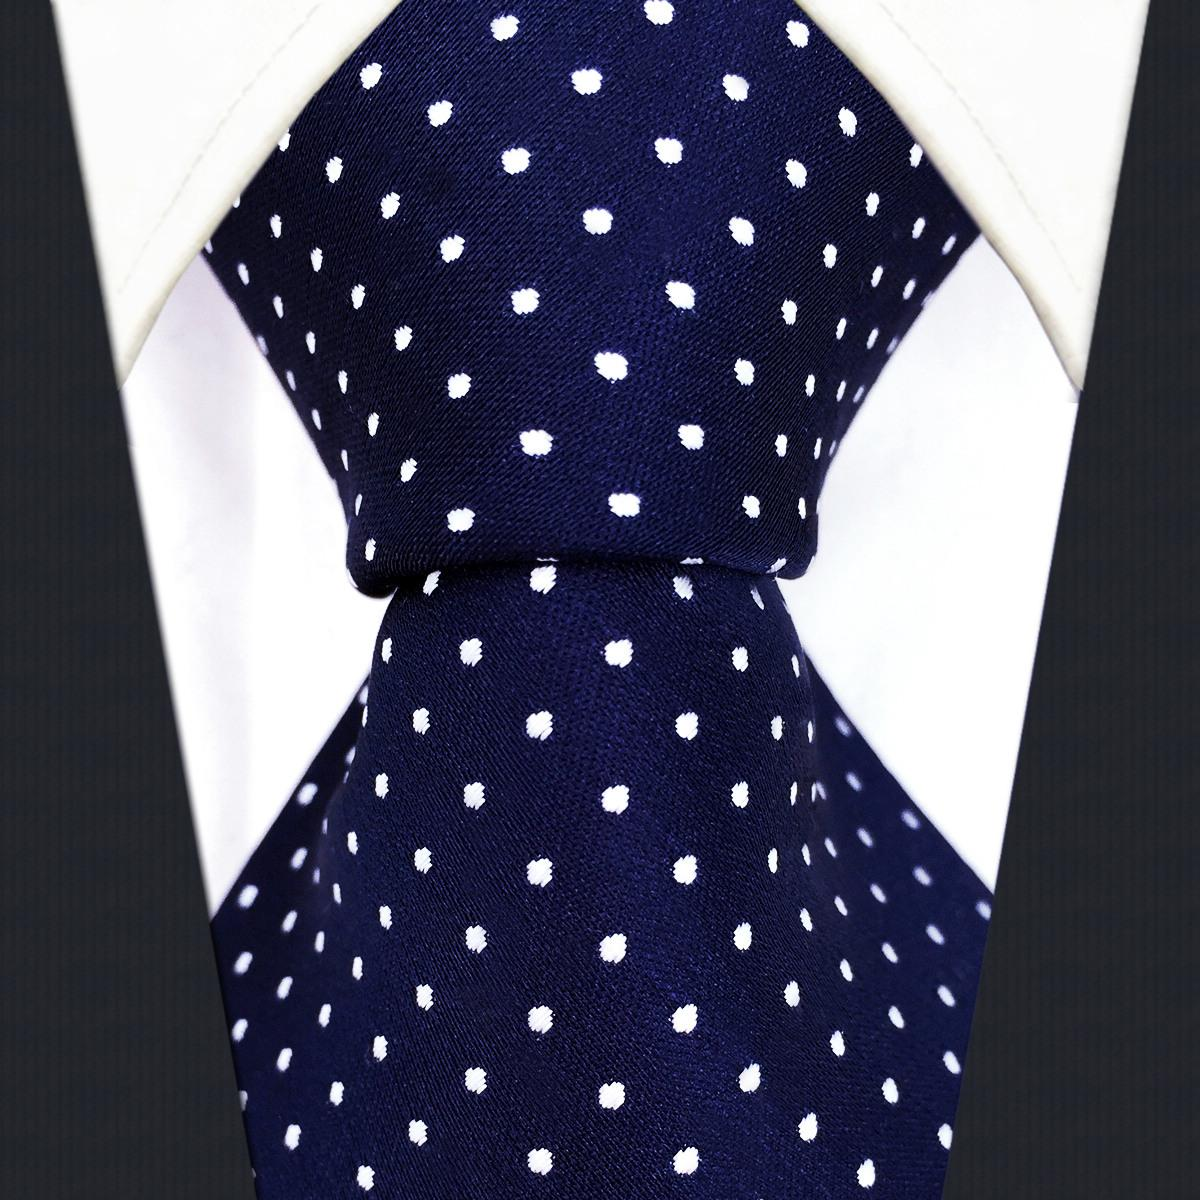 S6 점 해군 다크 블루 화이트 패션 남성 넥타이 넥타이 100 % 실크 엑스트라 롱 사이즈 자카드 직물